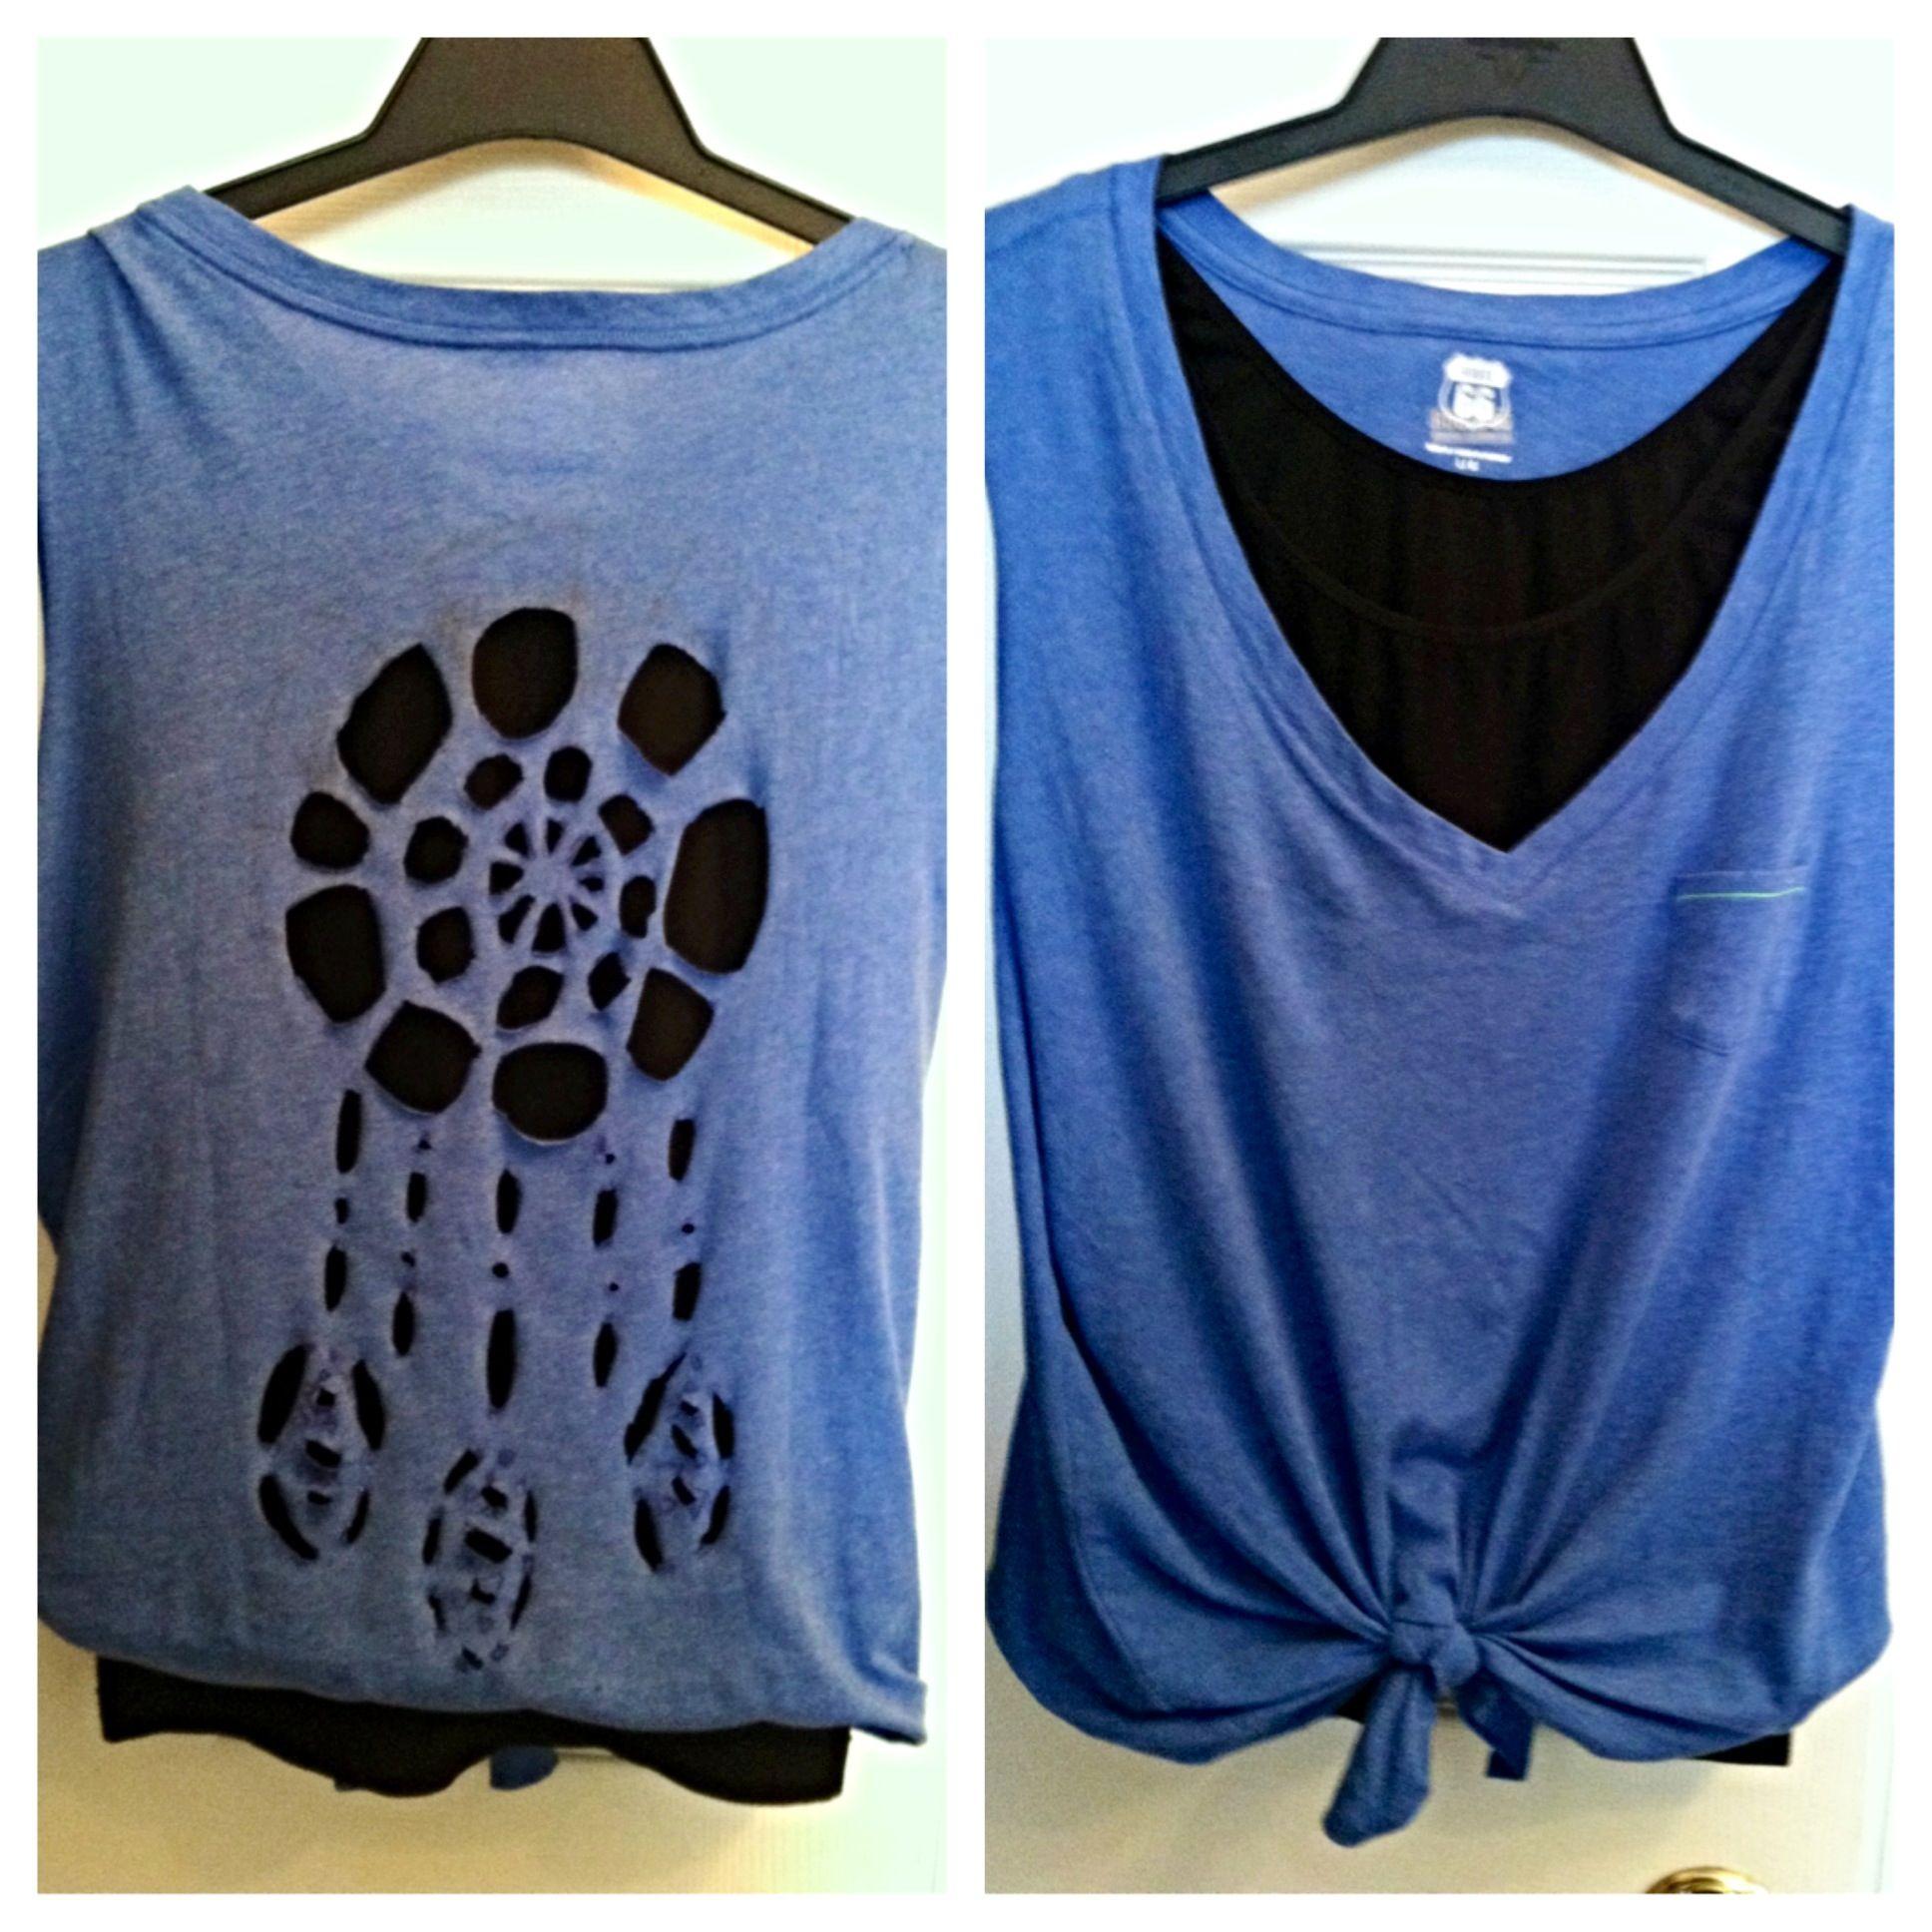 Diy Dreamcatcher Cut Out Shirt Make For Hannahs 21st Fashion